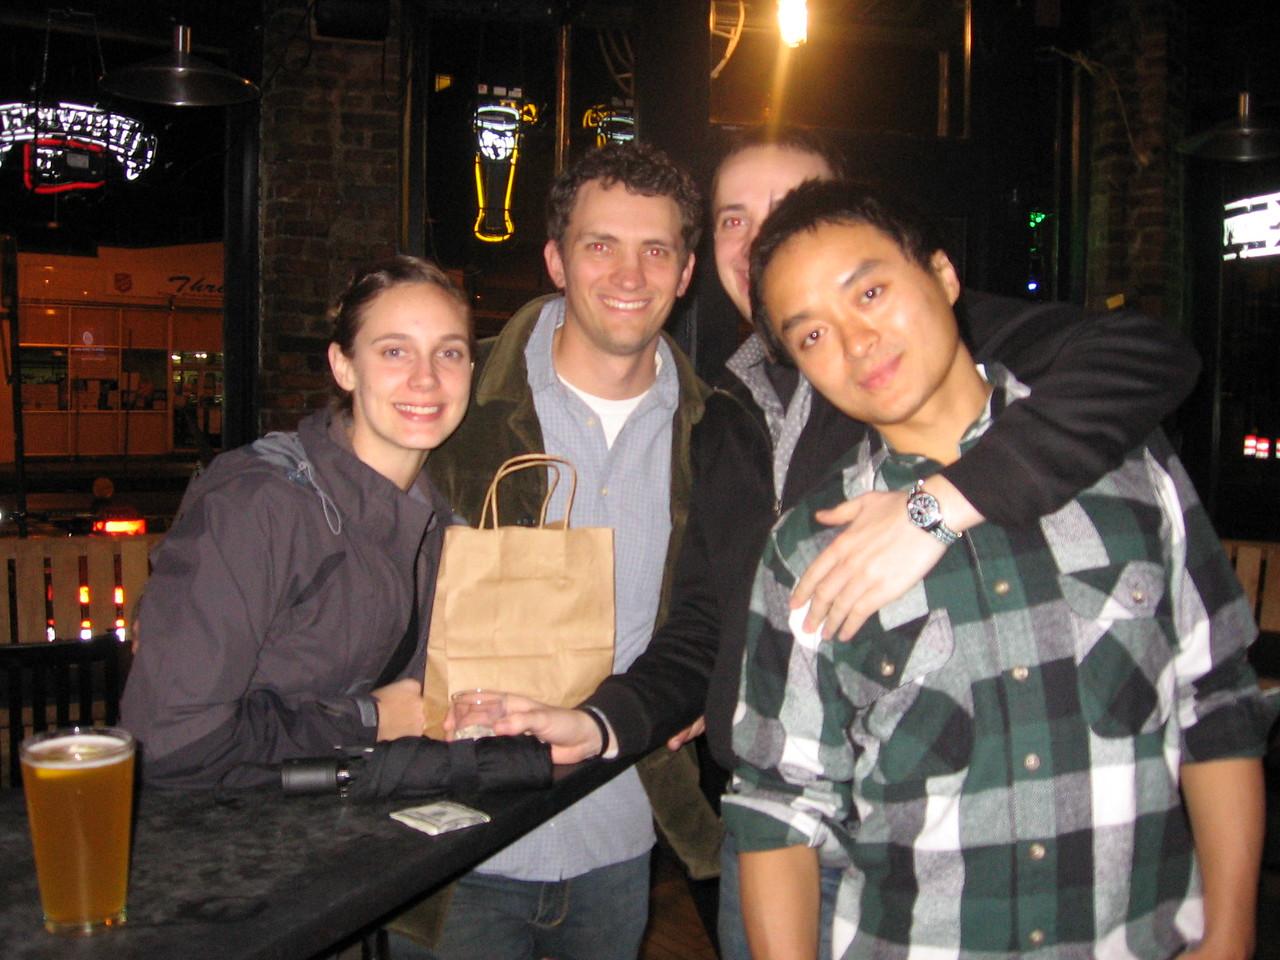 me, paul, eric and chris